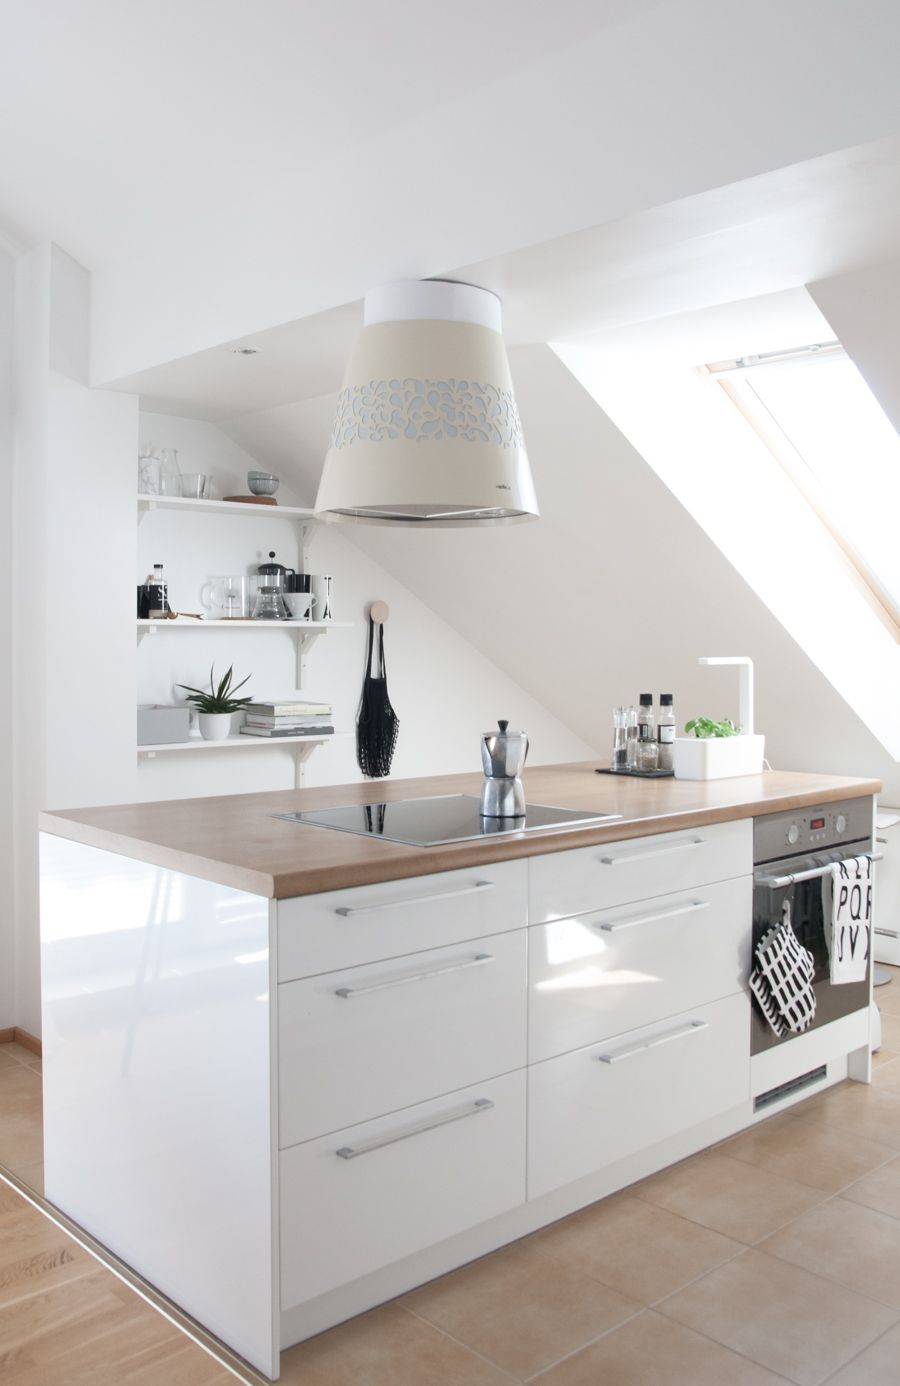 Best 20 Scandinavian kitchens with islands ideas on Pinterest